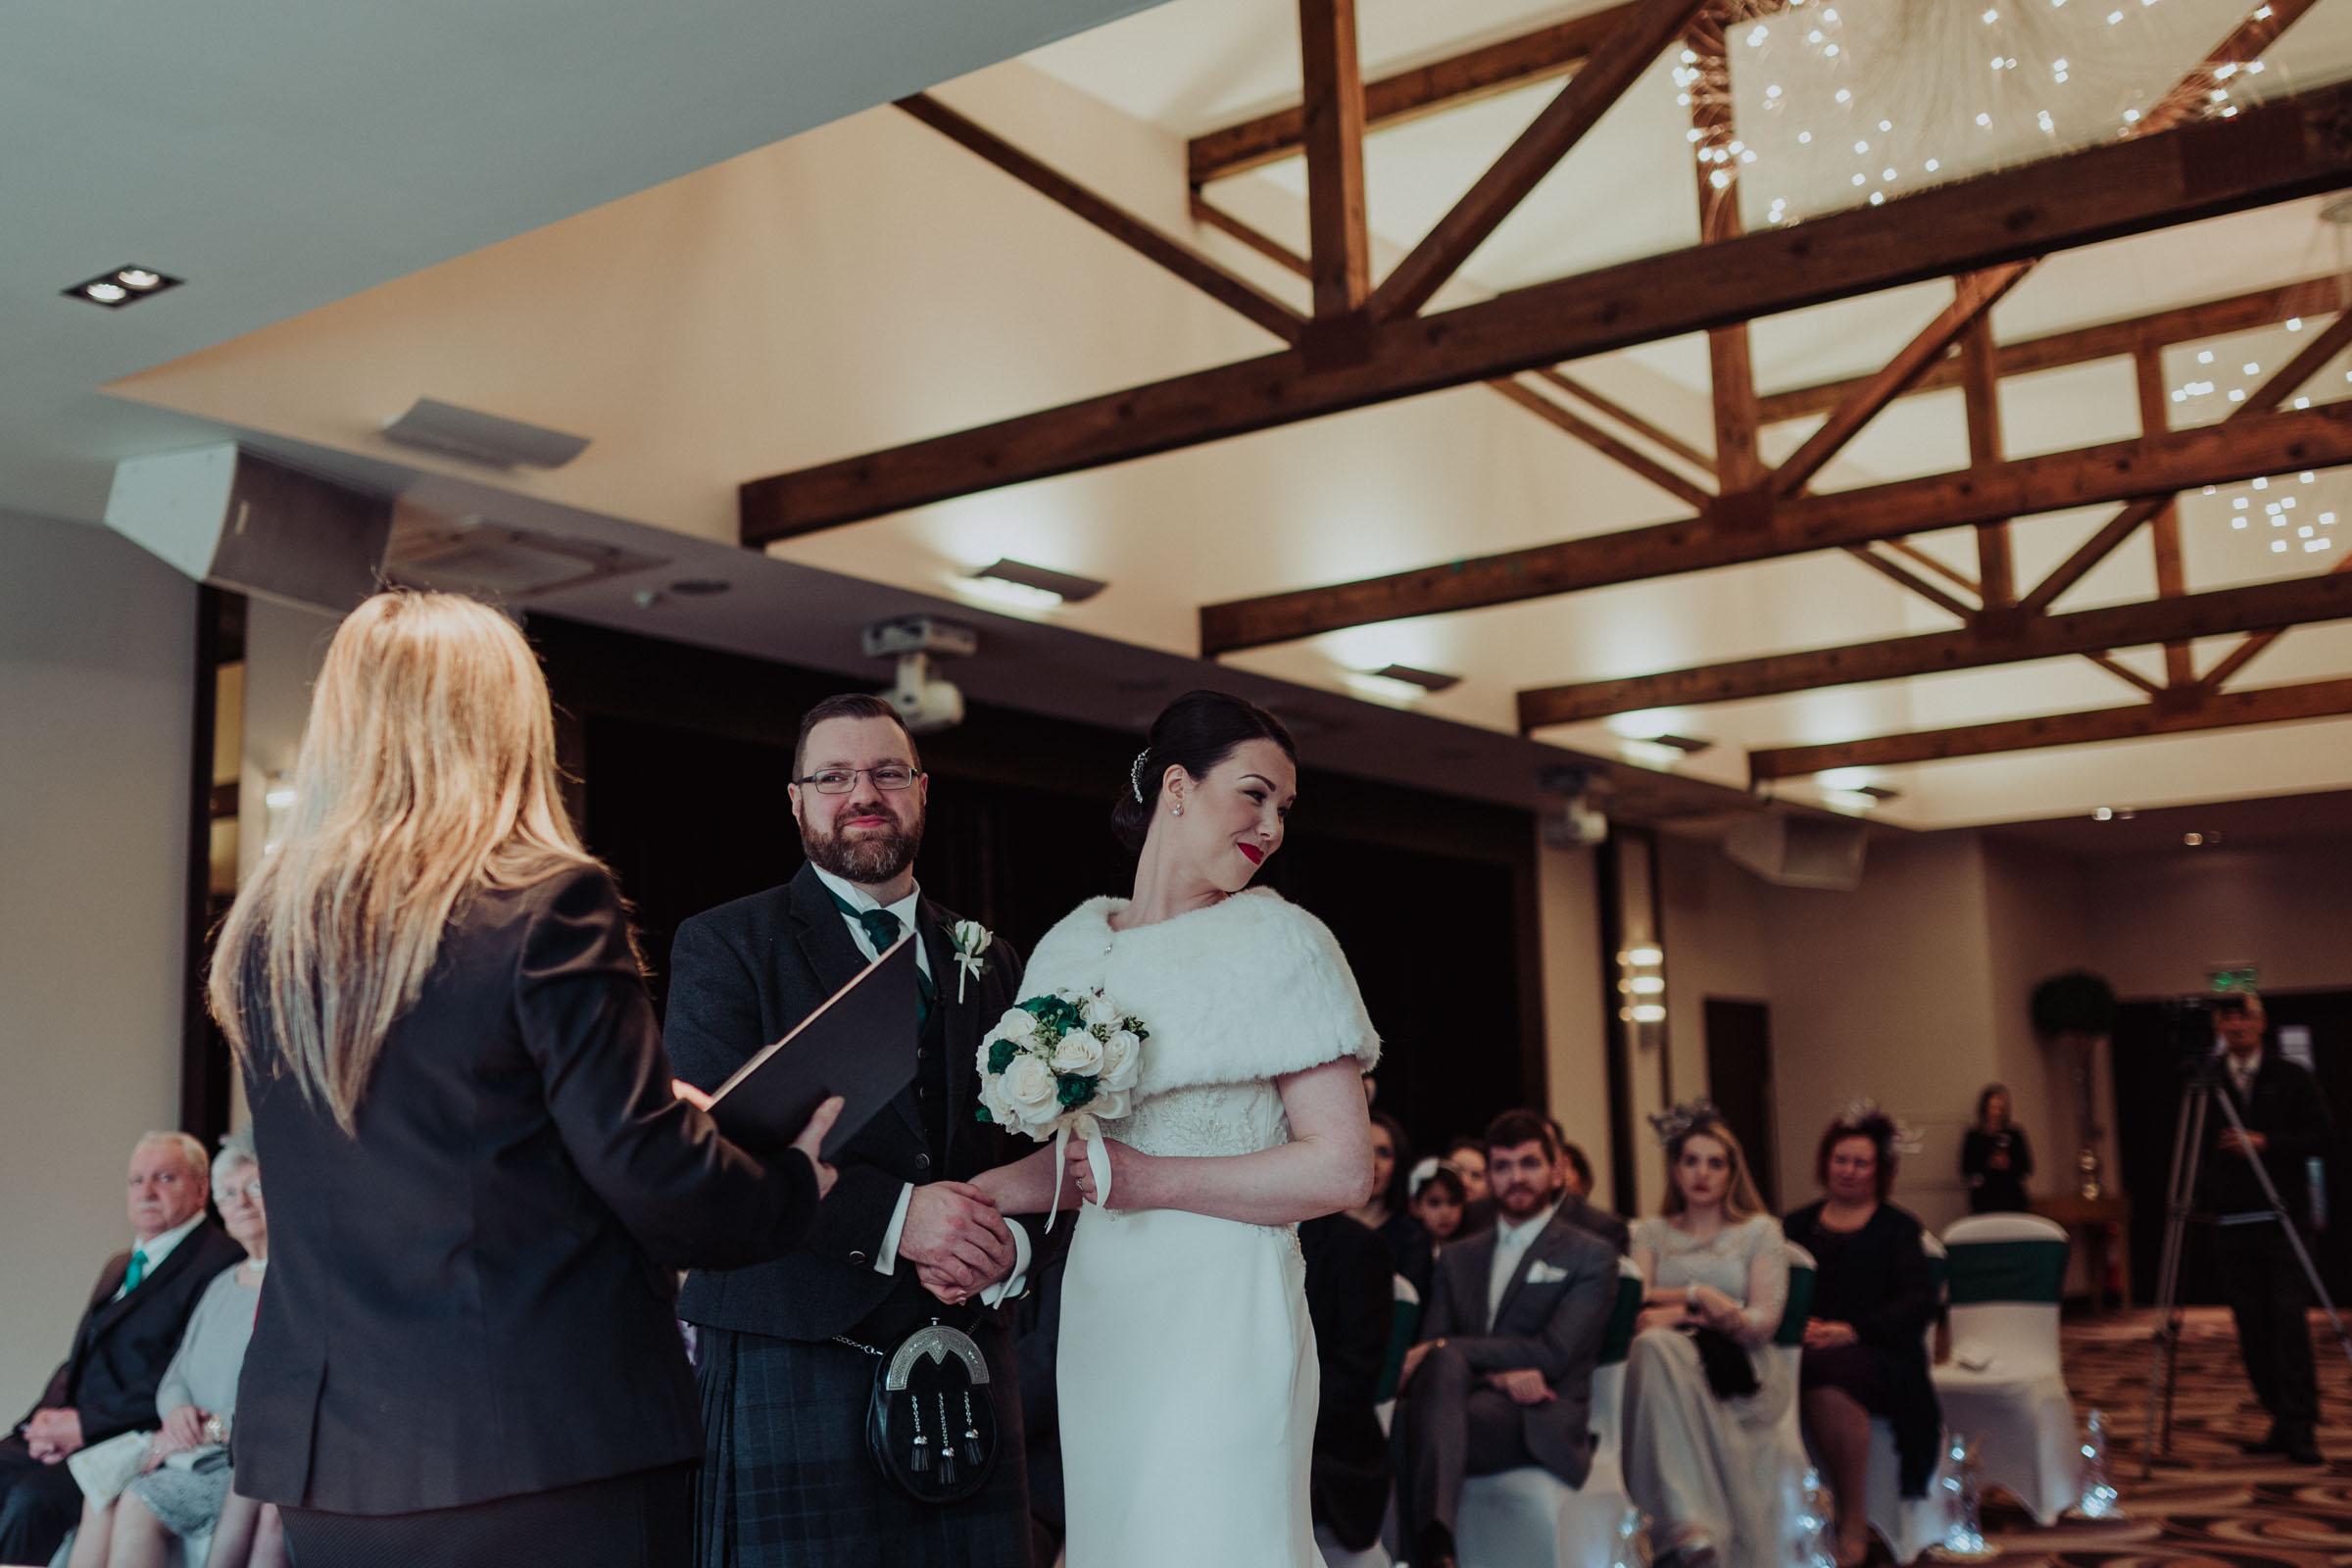 Radstone-Wedding-Dearly-Photography-Scotland (15 of 50).jpg